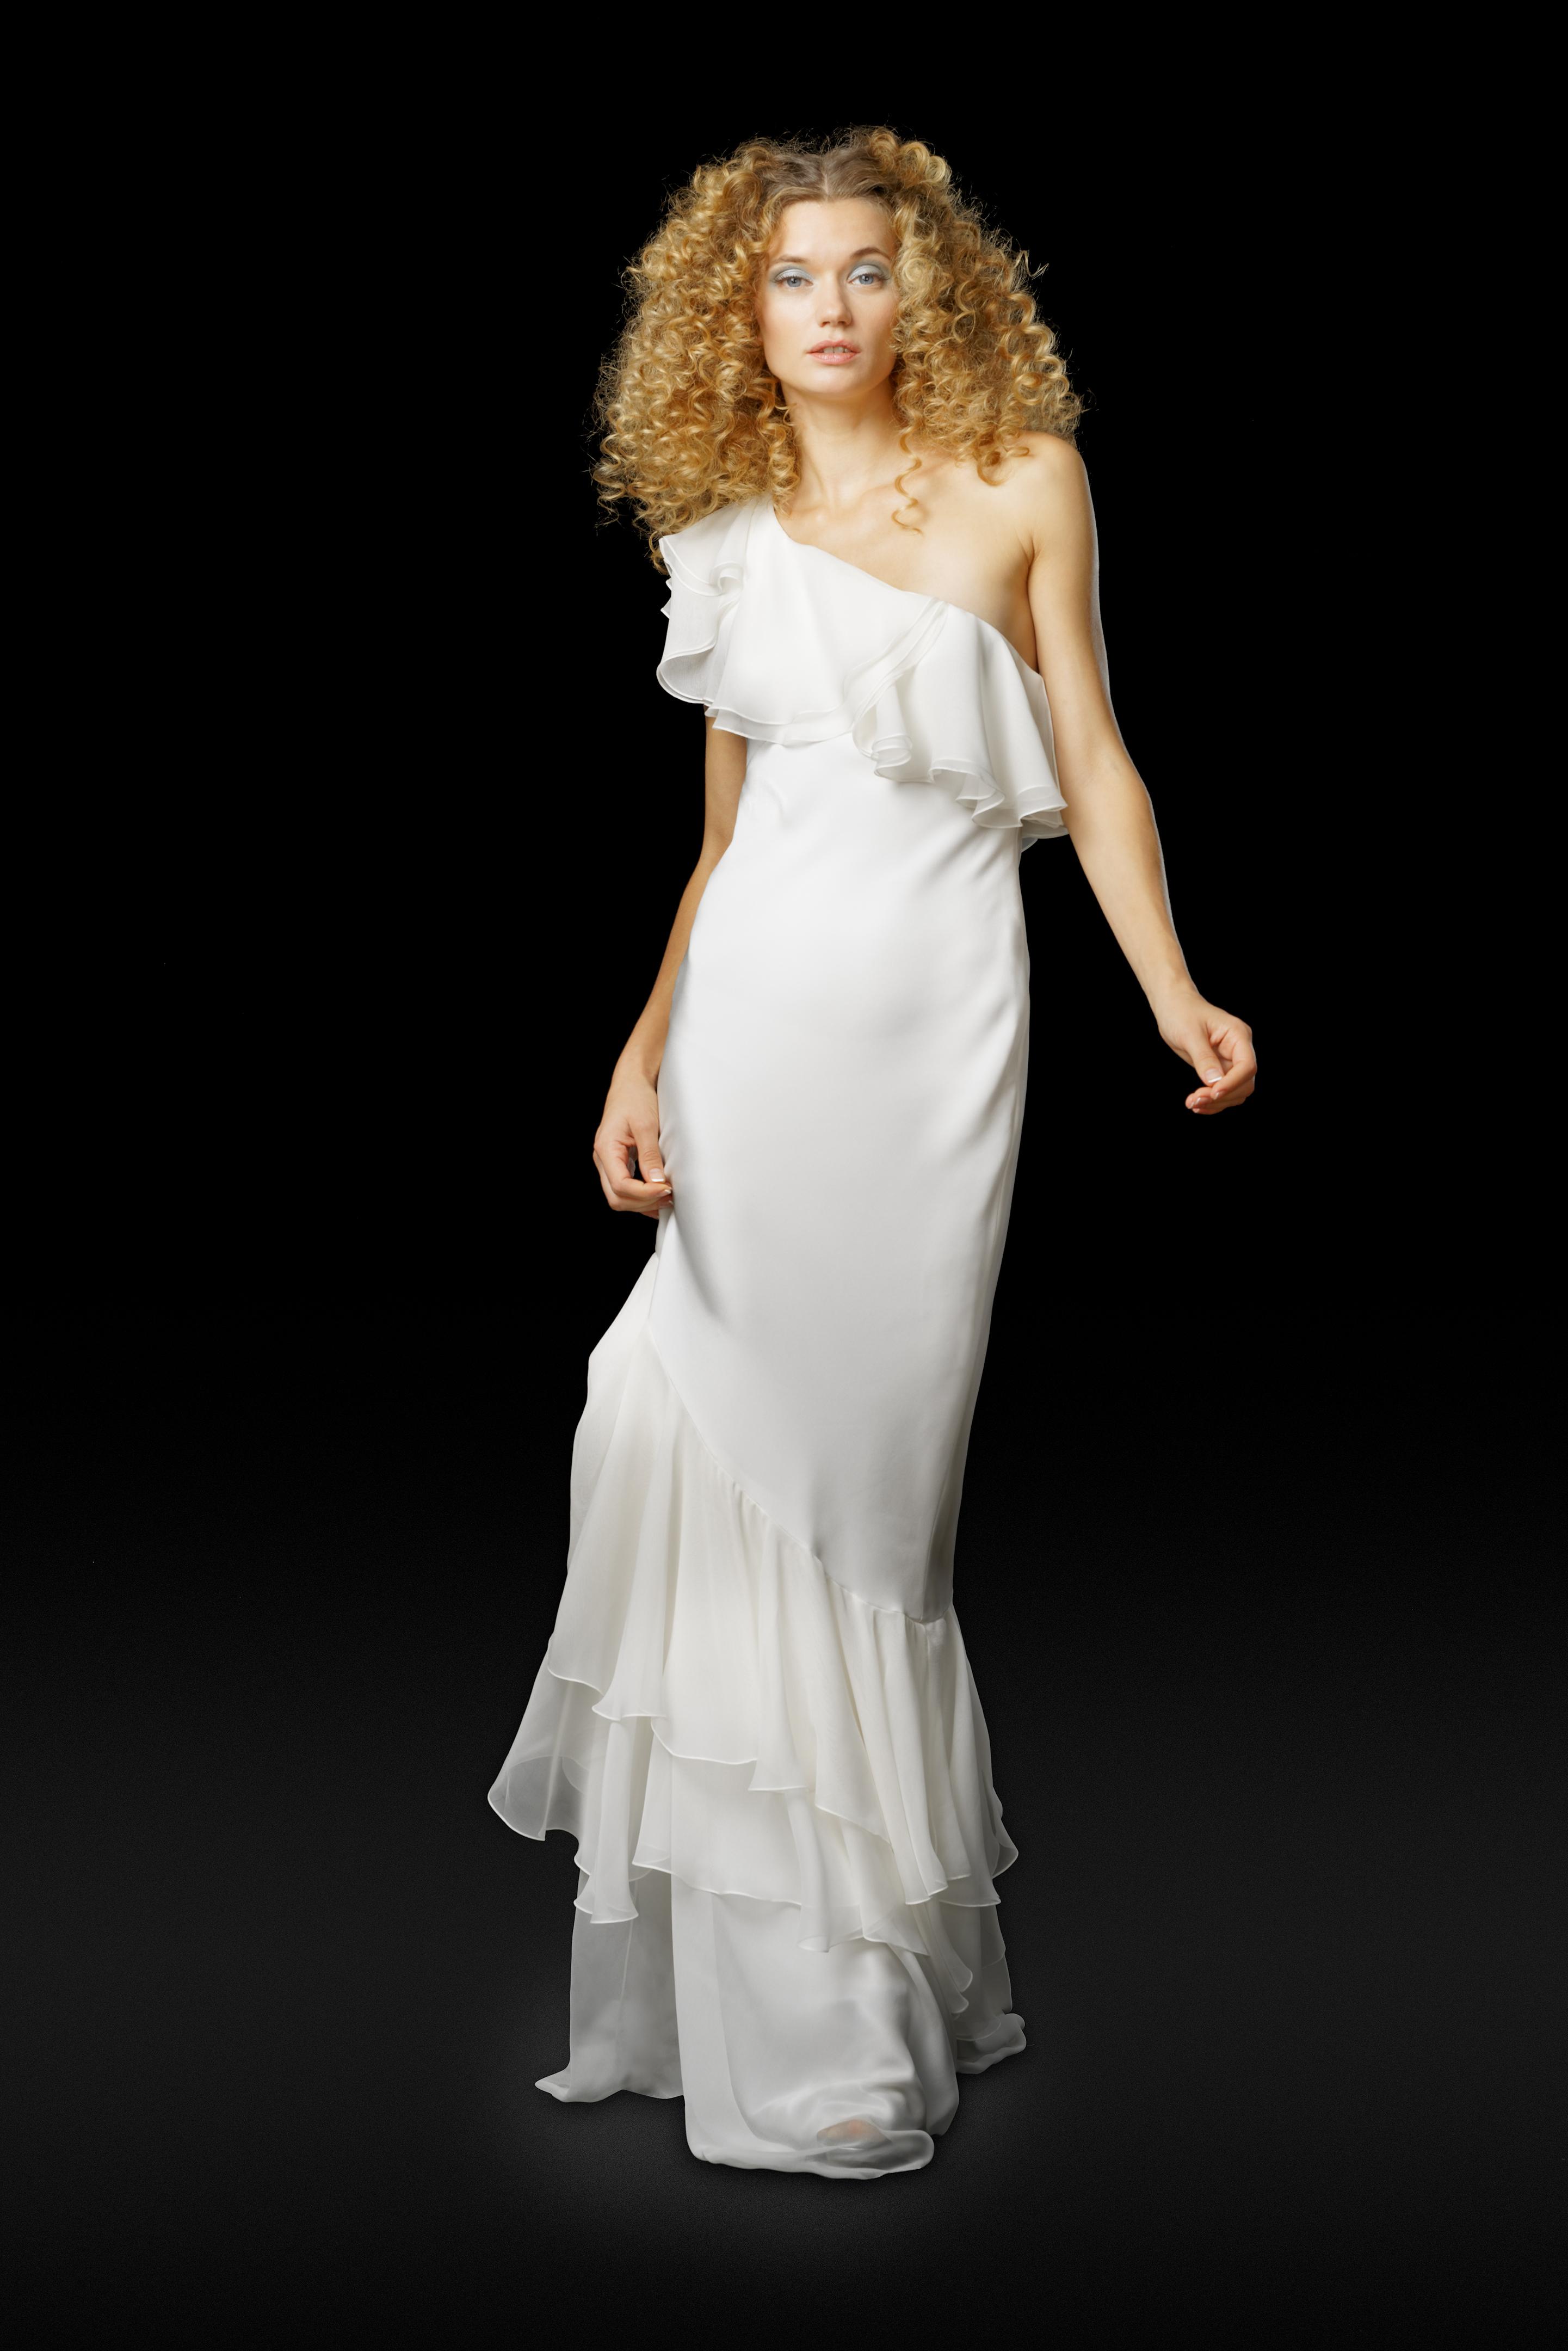 Elizabeth Fillmore Fall 2017 Wedding Dress Collection - Gina